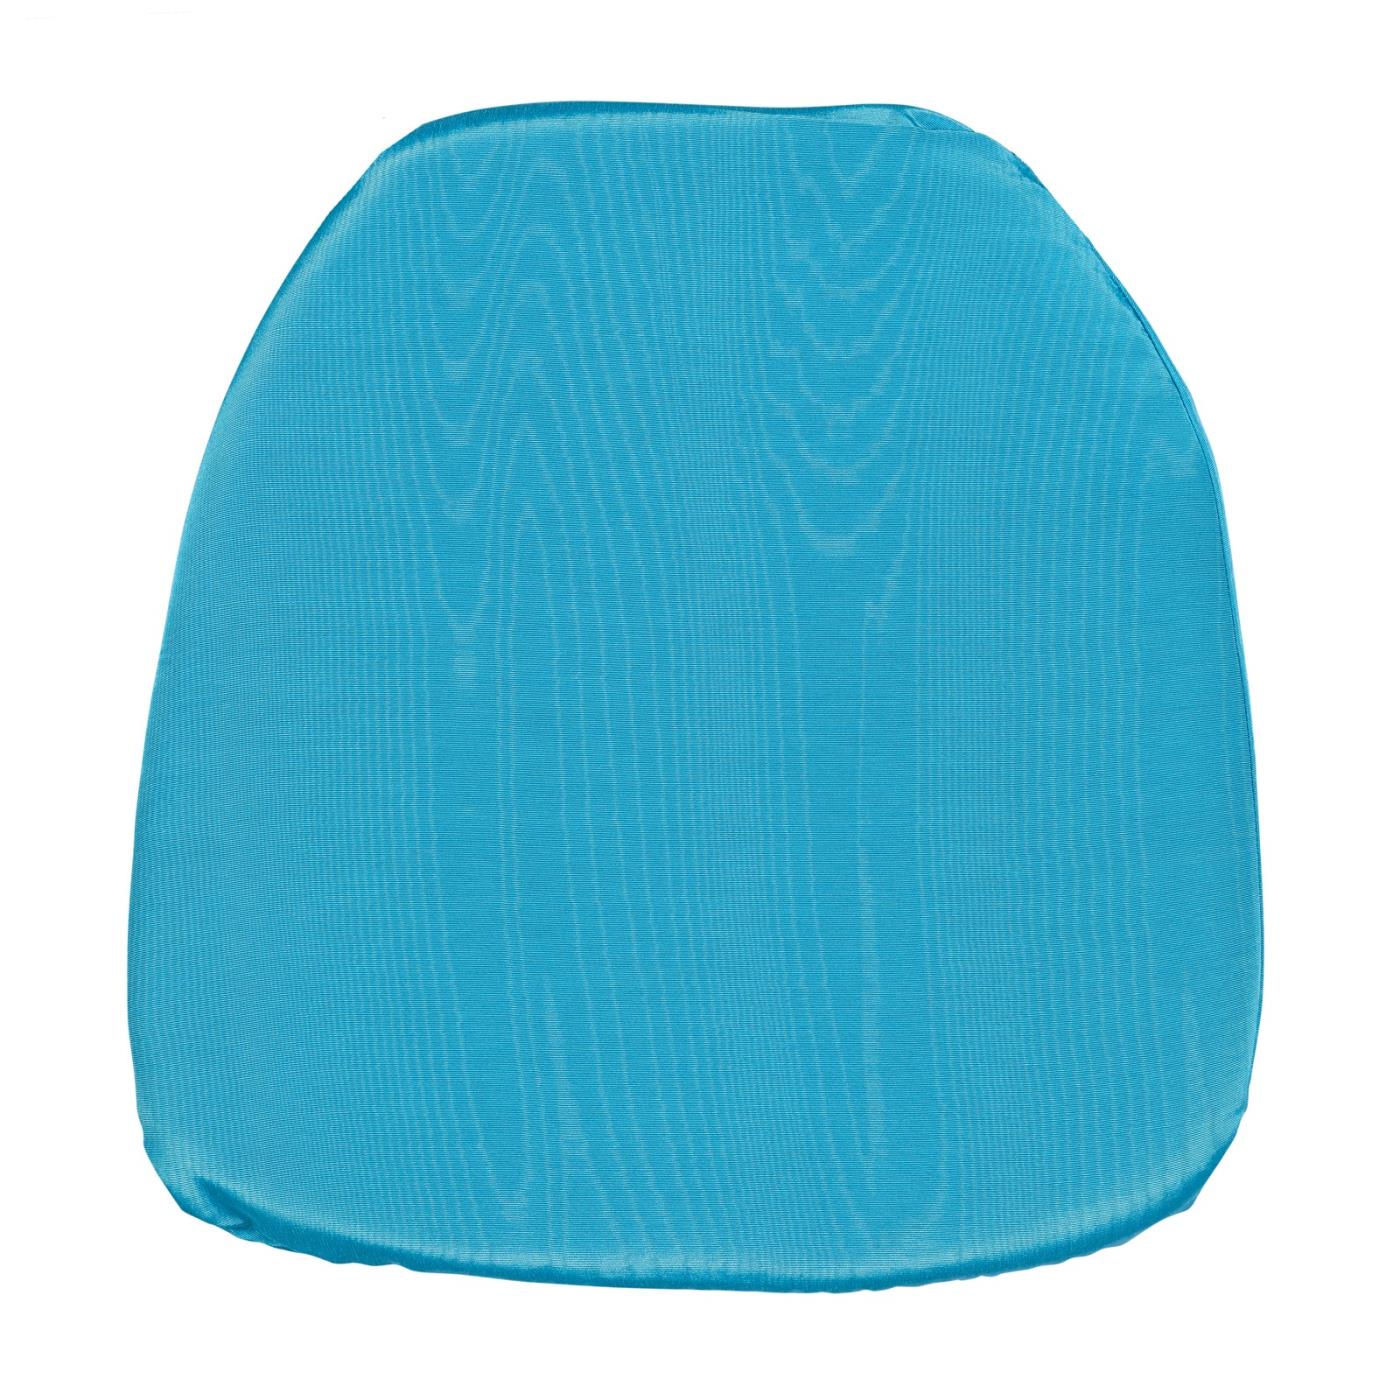 Bengaline Moire Seat Cushion - Turquiose